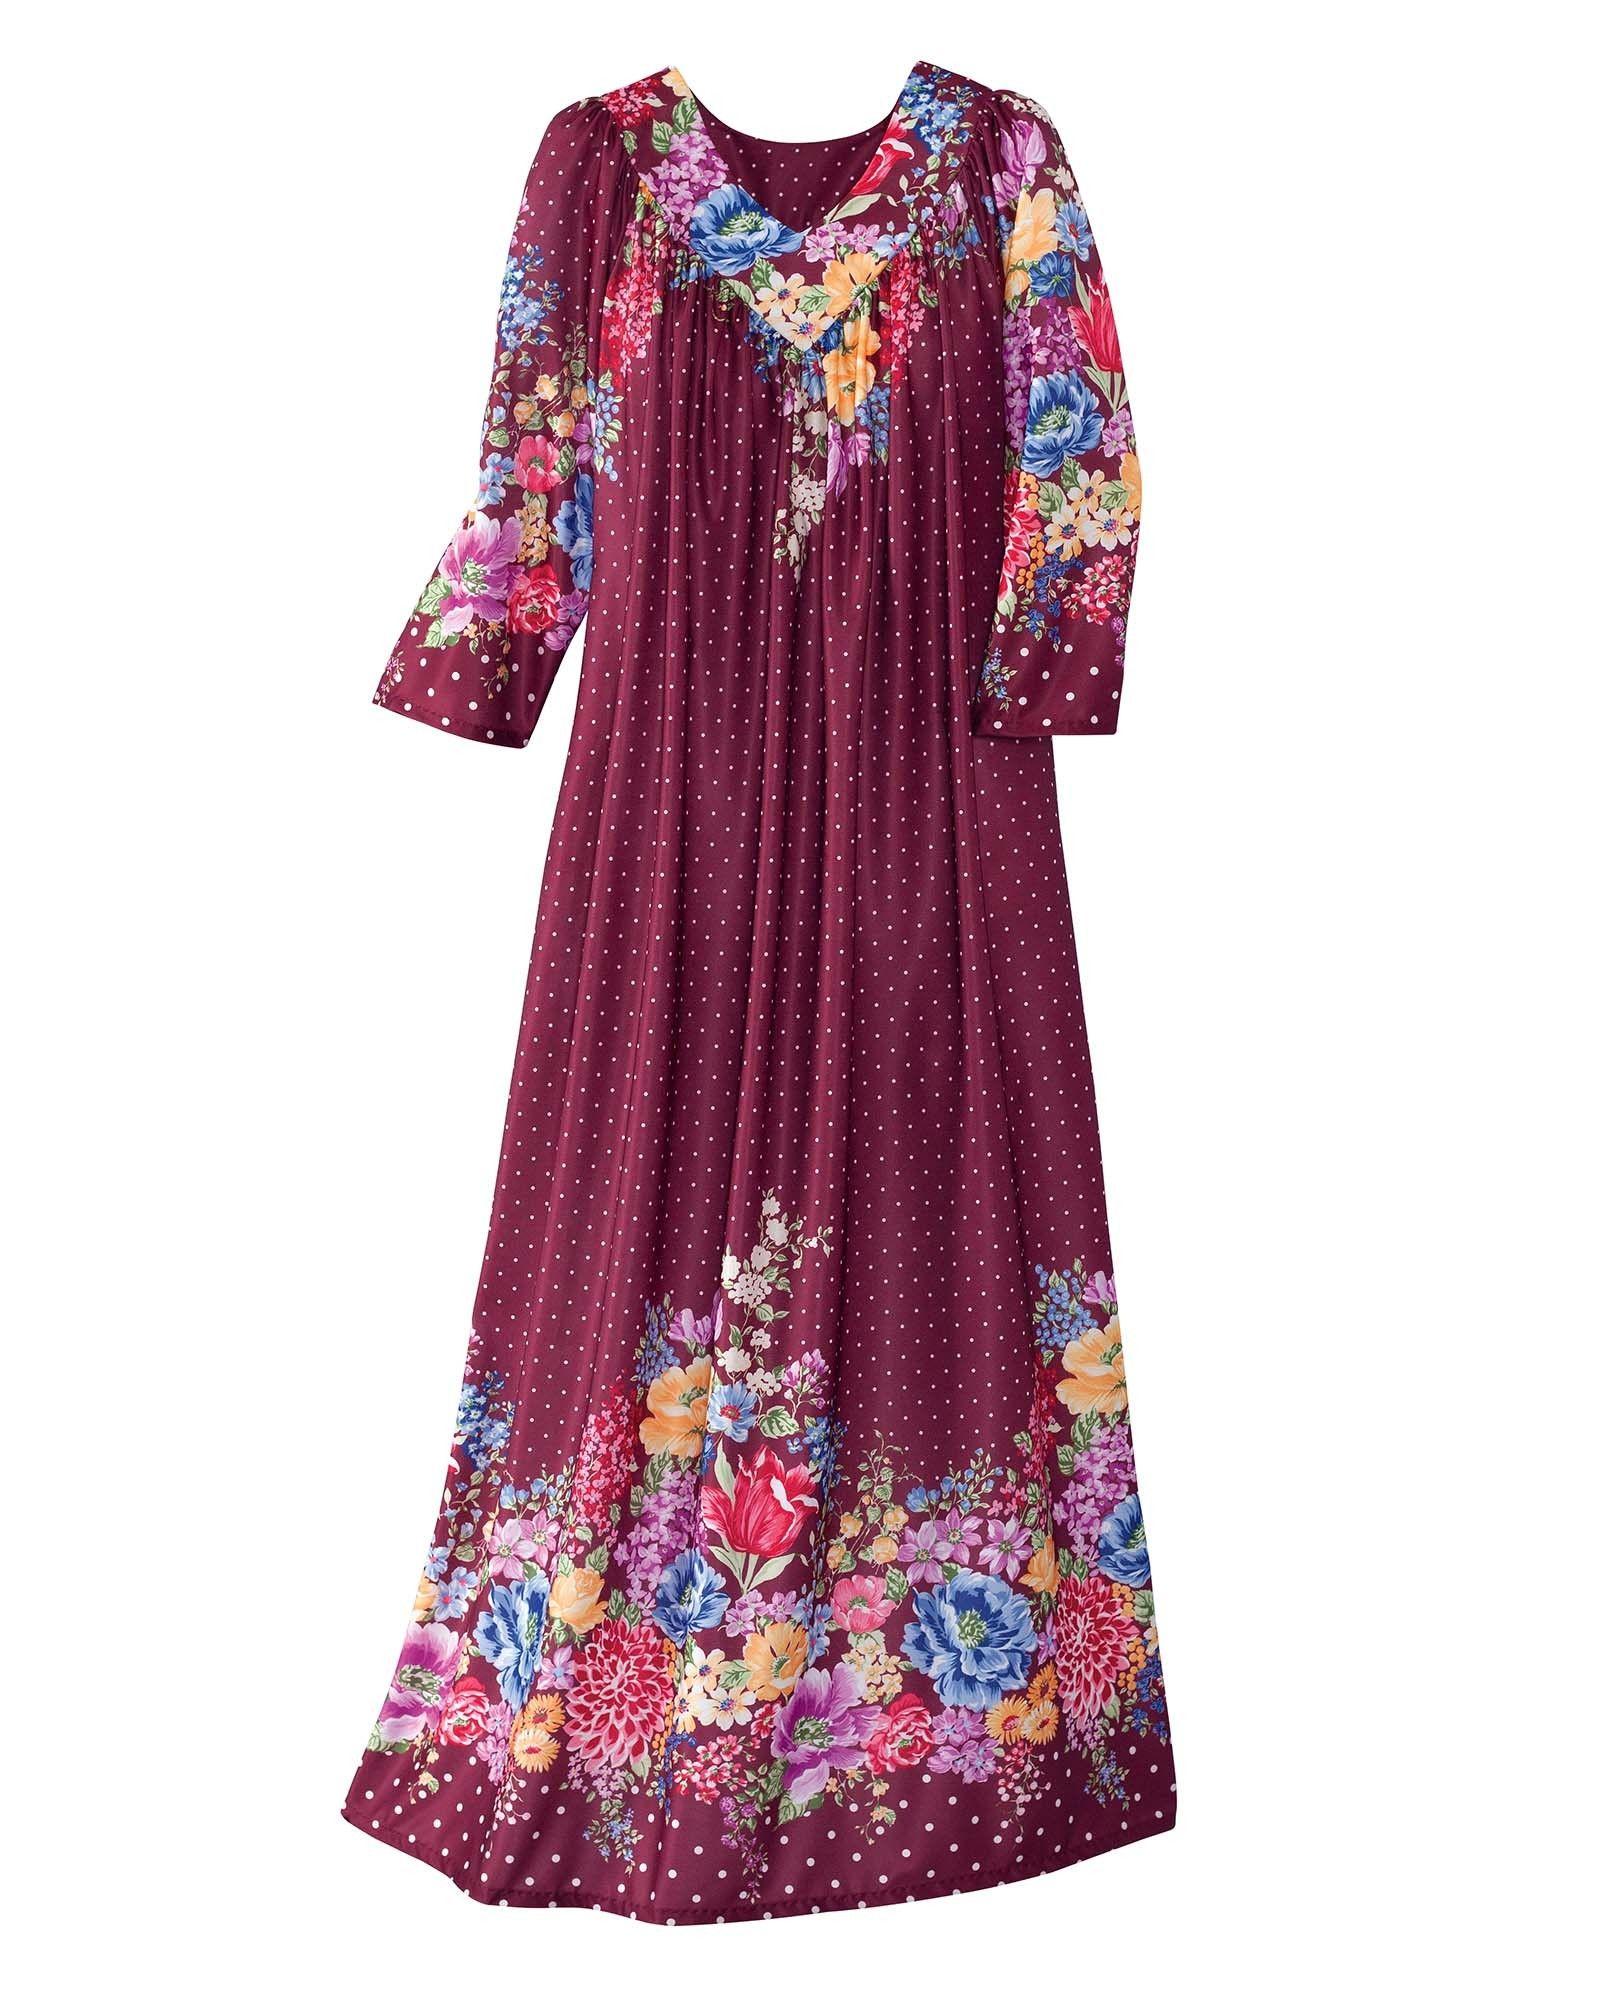 442c30f134b Ocean Breeze Crinkle Dress